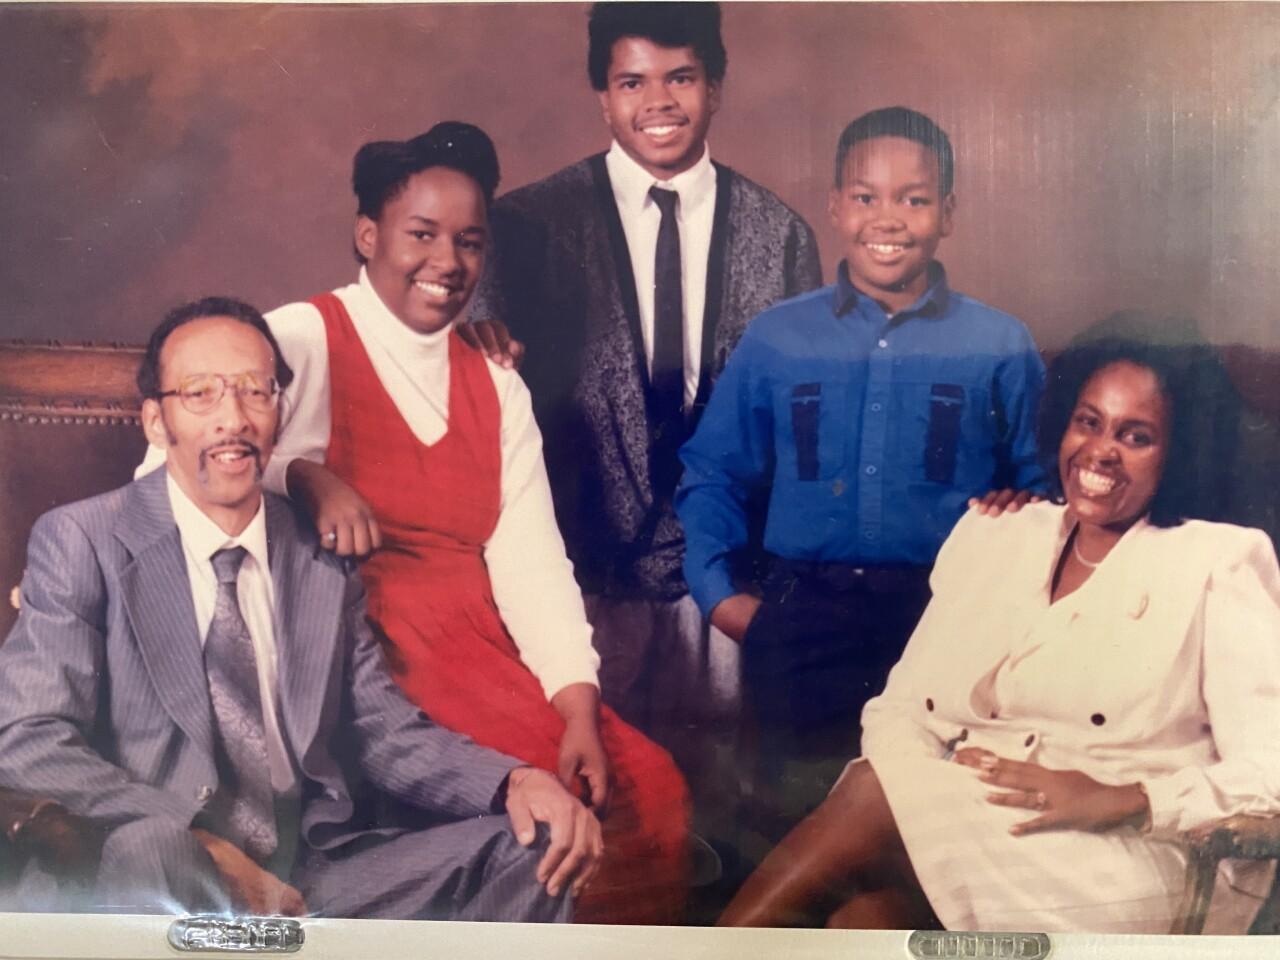 Reginald adoptive family (Desiree is new mom).jpg